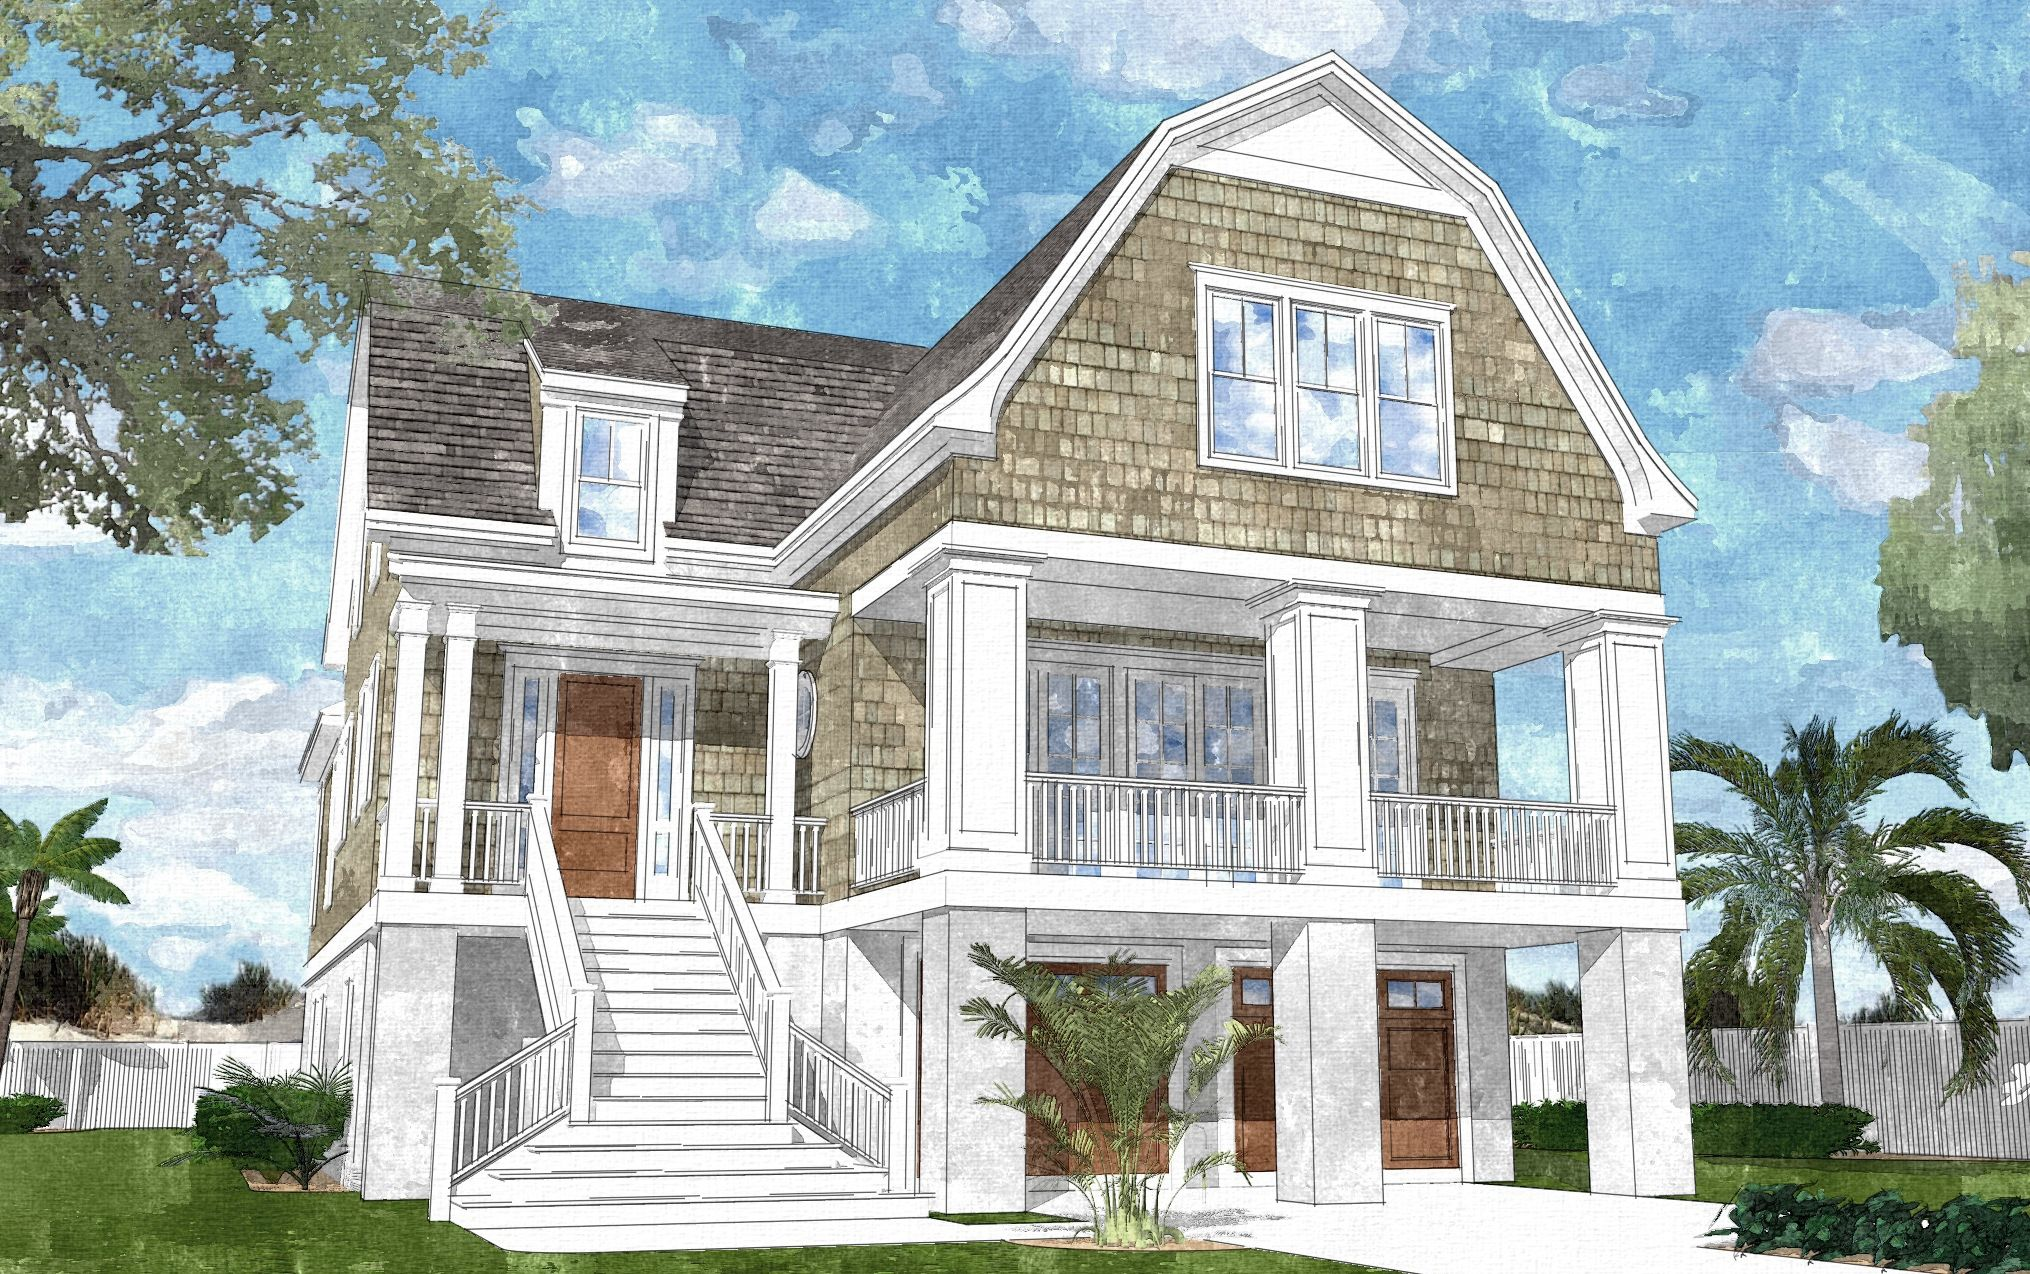 Plan NC Gambrel Roofed Shingle Style House Plan